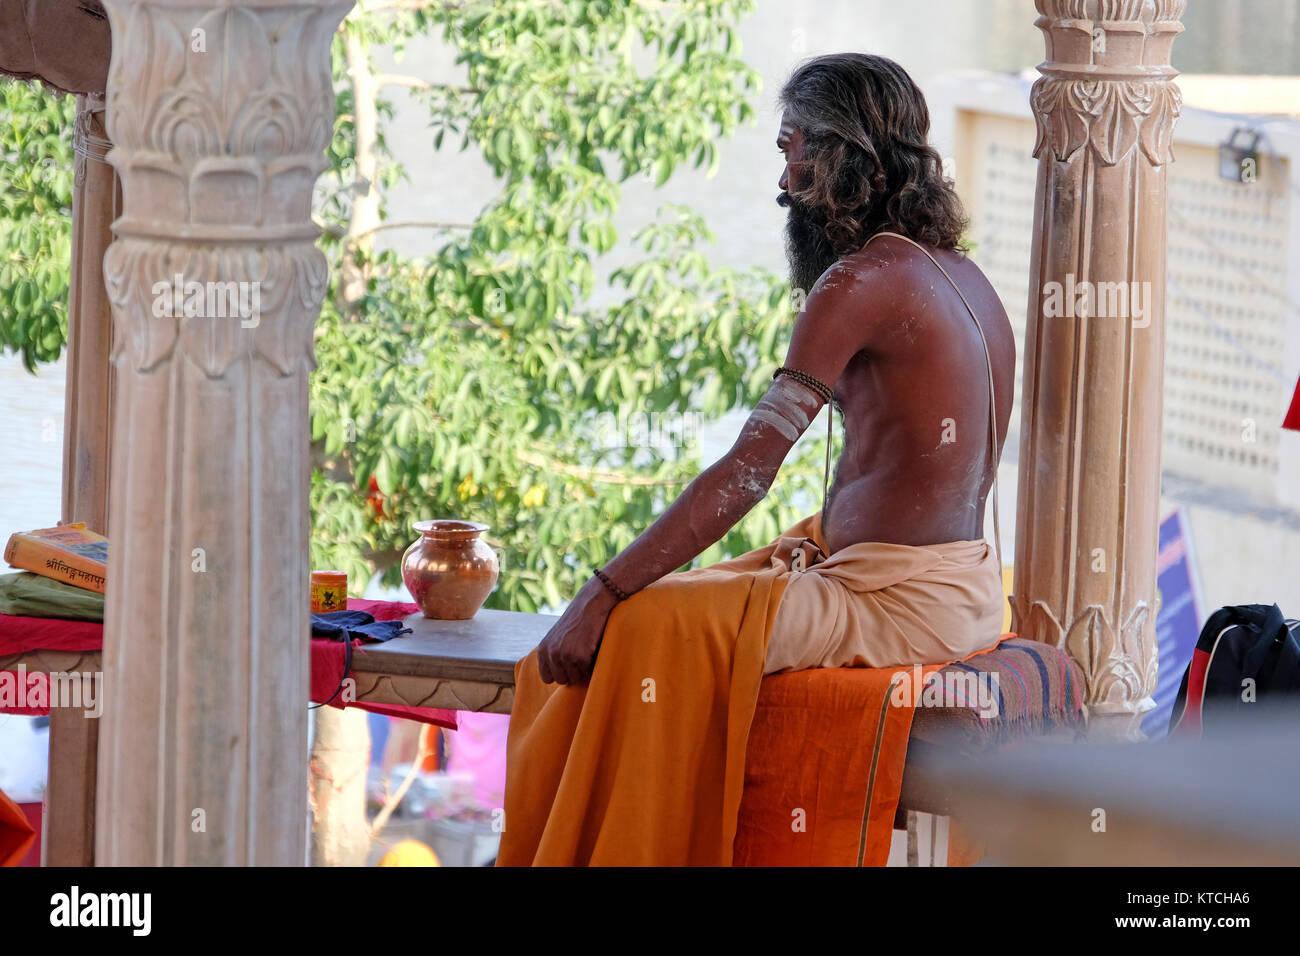 An Indian Holy man (Sadhu, Saddhu) at the Ghats, Pushkar, Rajasthan,India - Stock Image